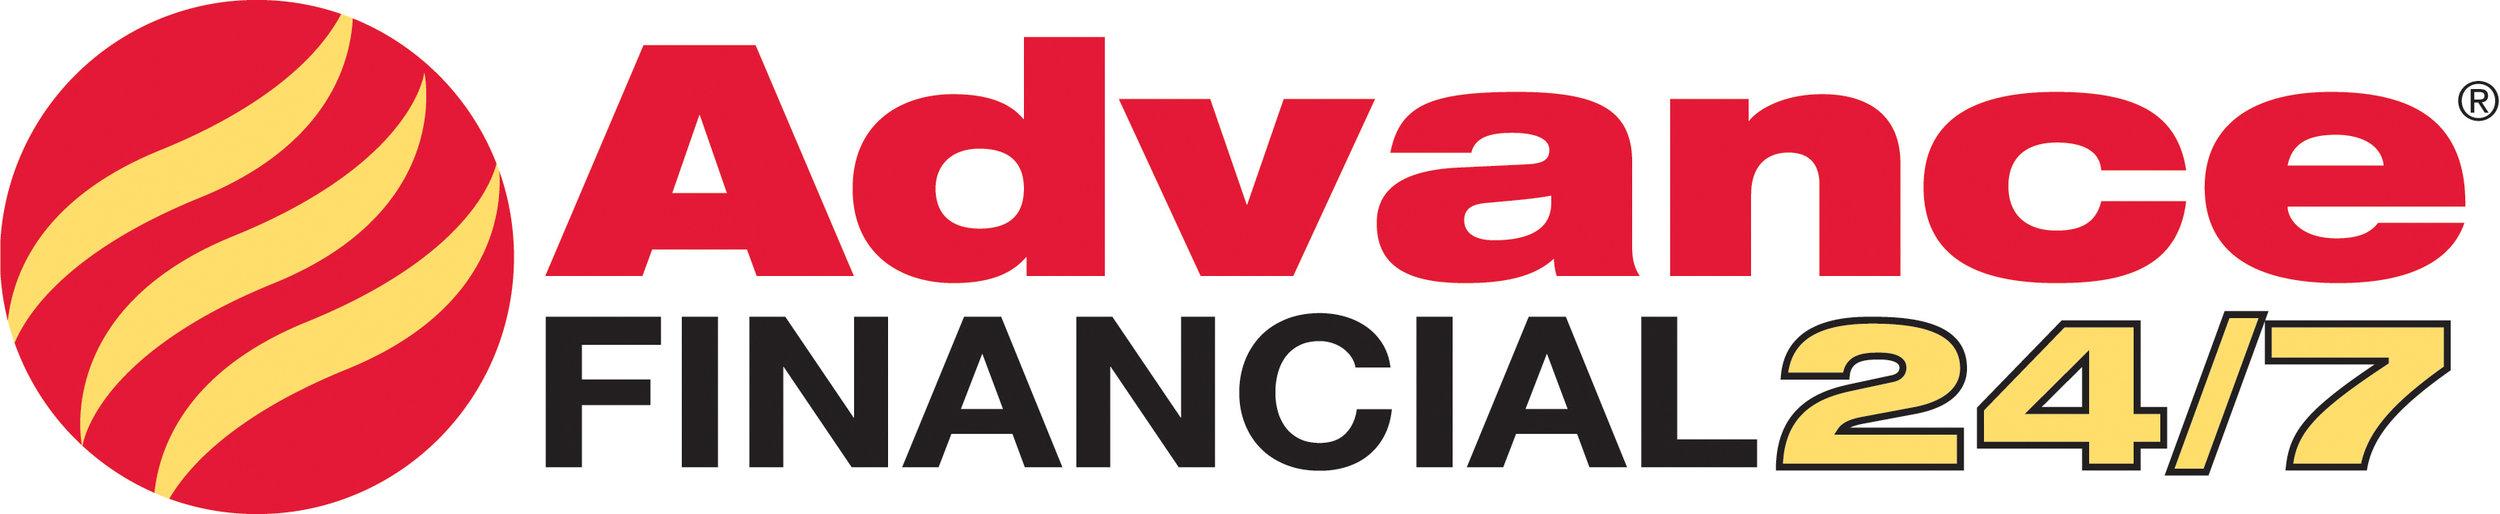 advance financial logo247-reg.jpg